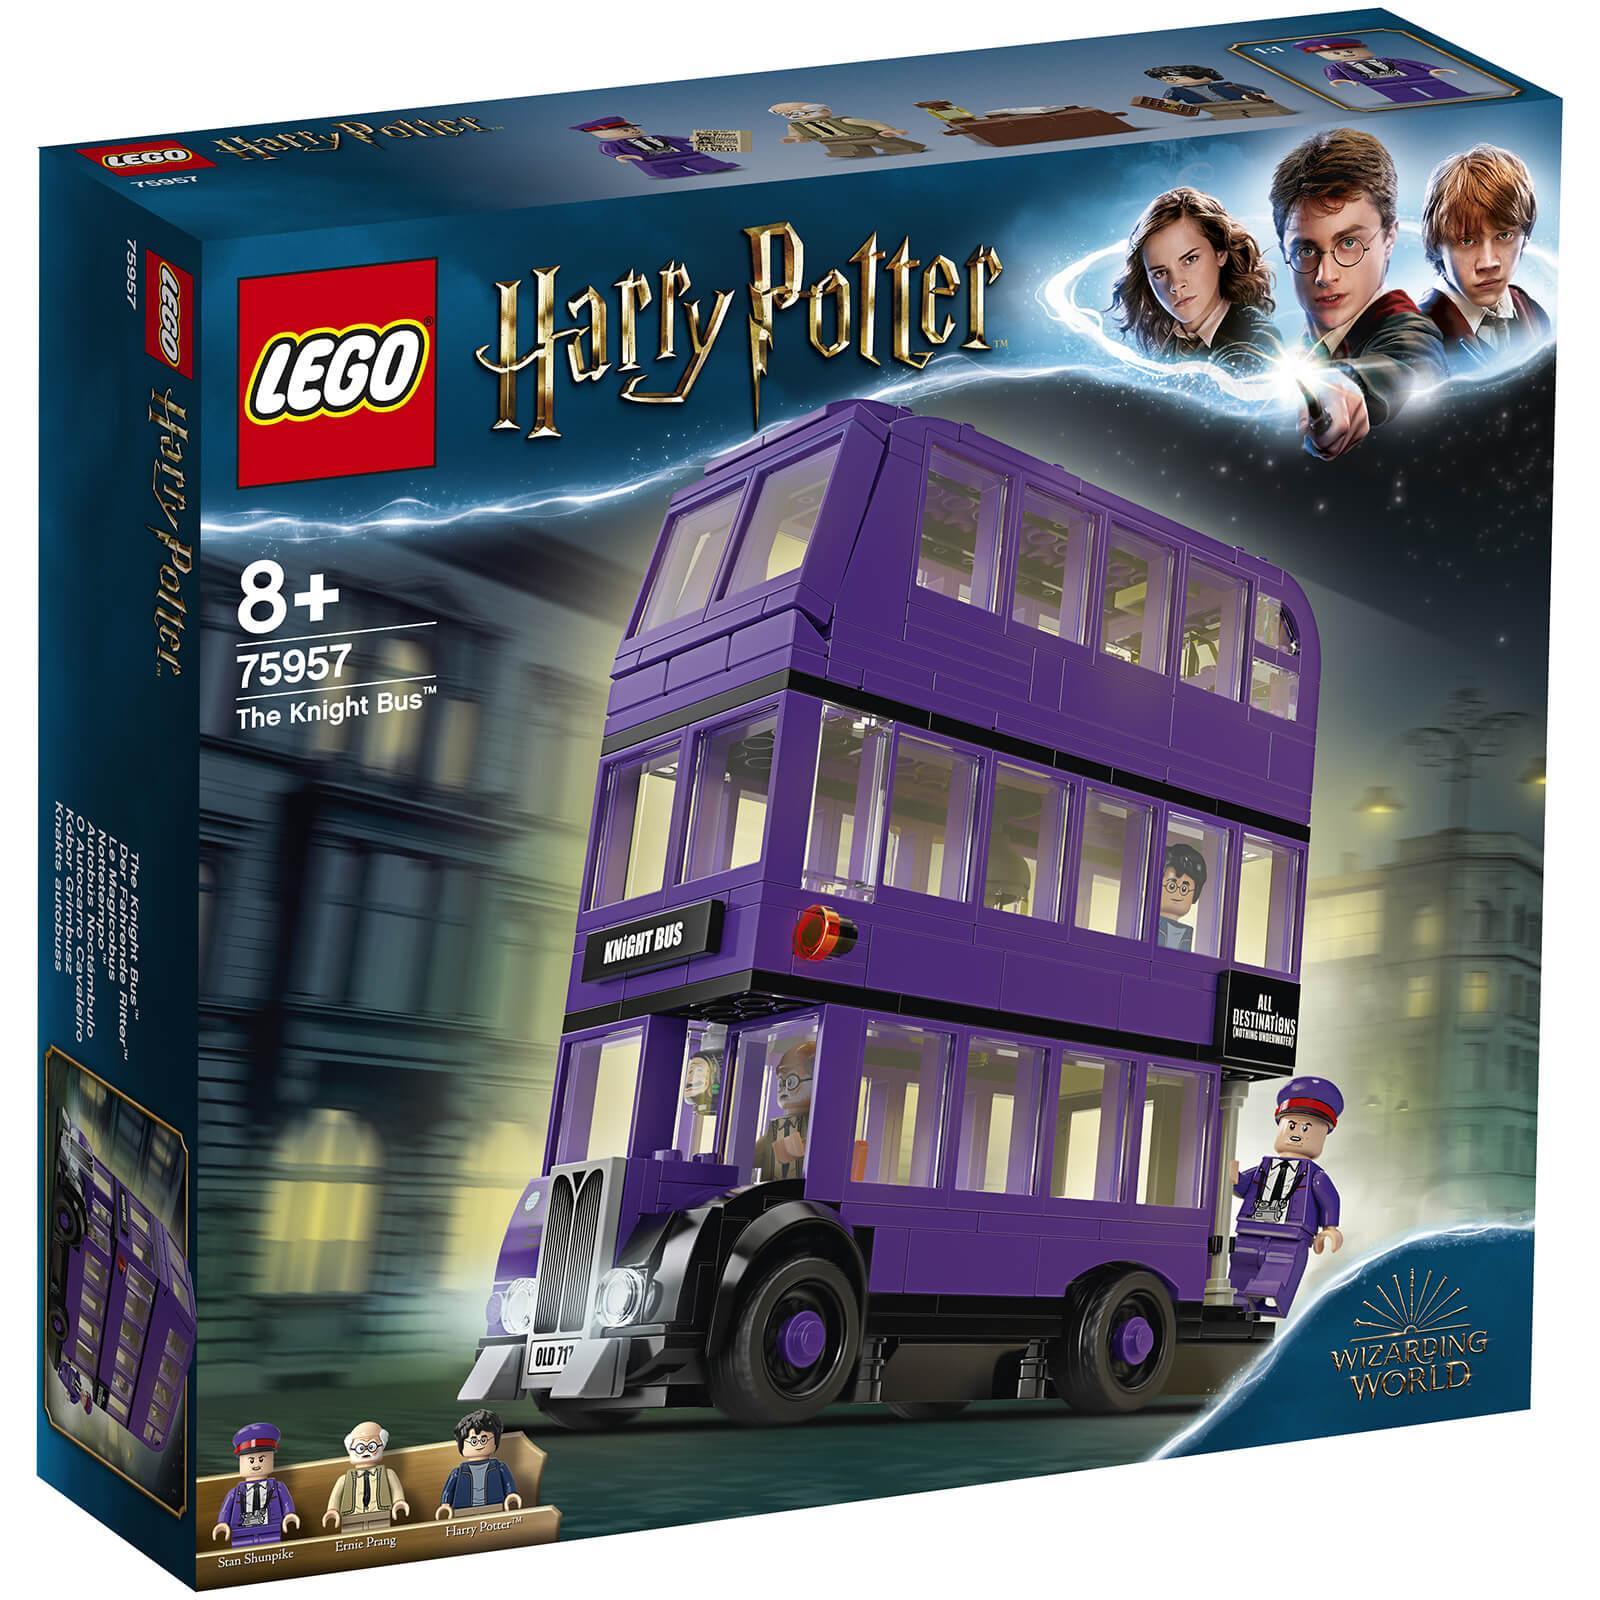 Lego Harry Potter: The Knight Bus (75957)